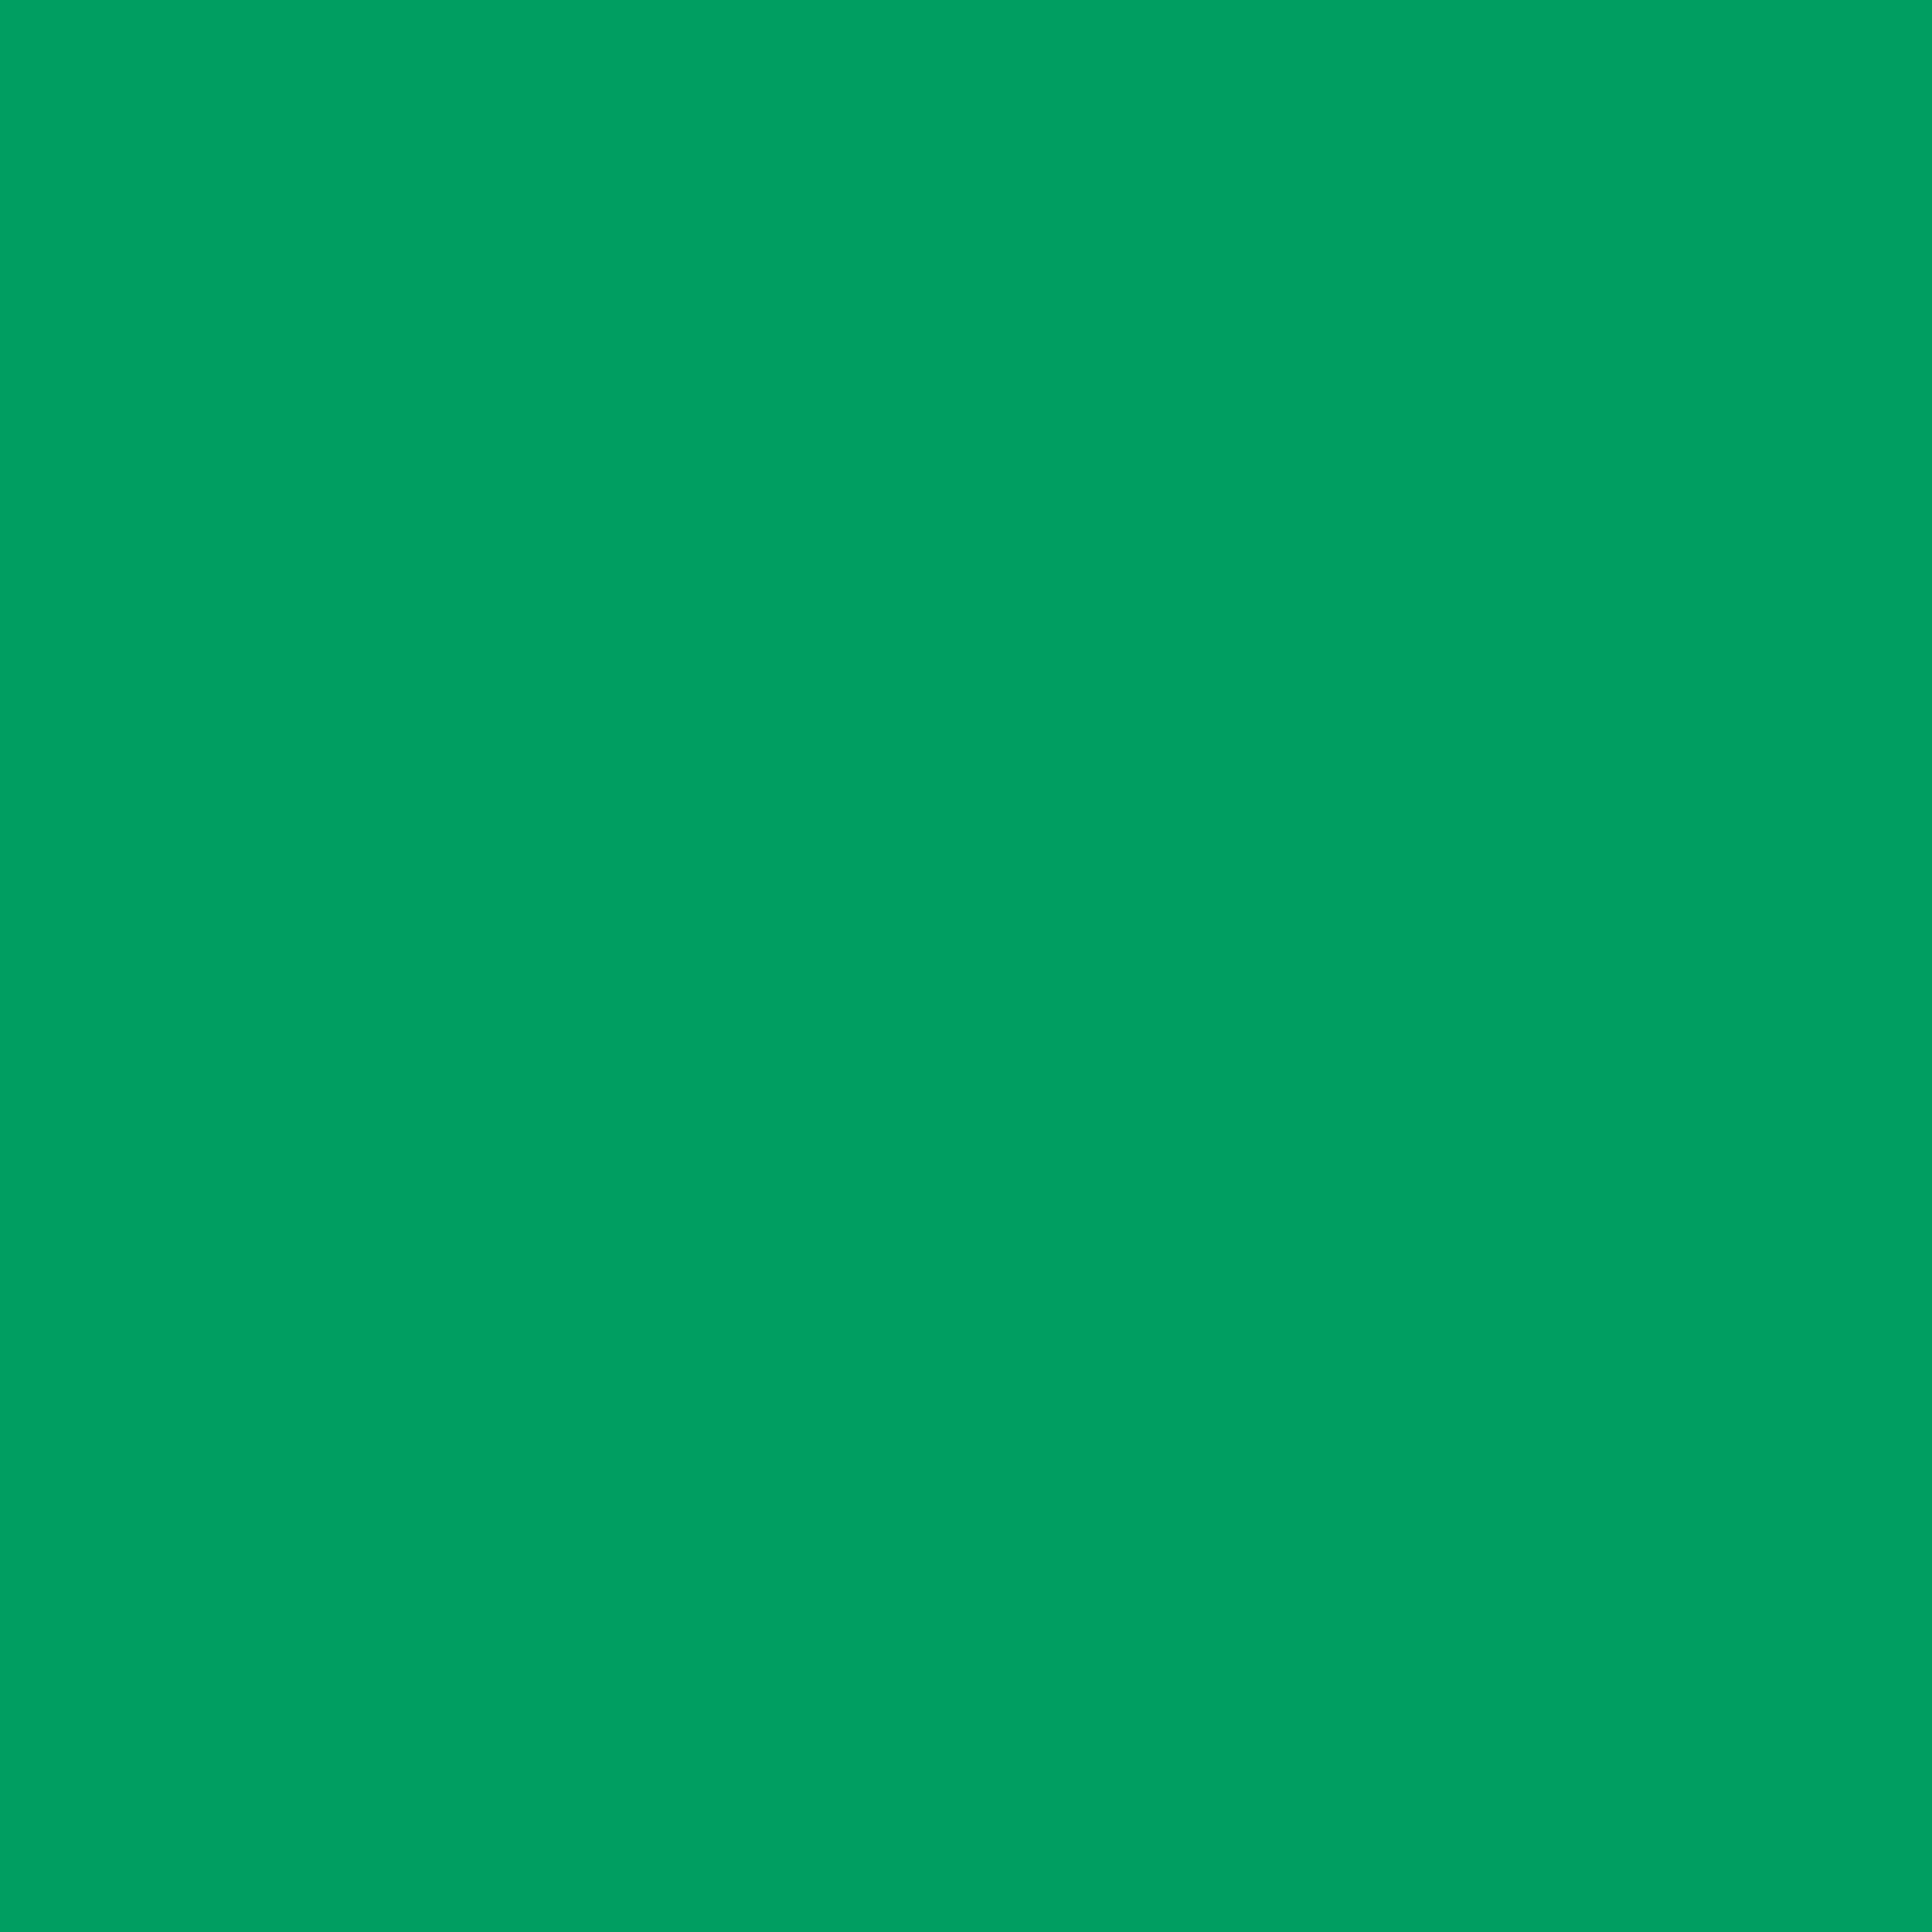 3600x3600 Shamrock Green Solid Color Background